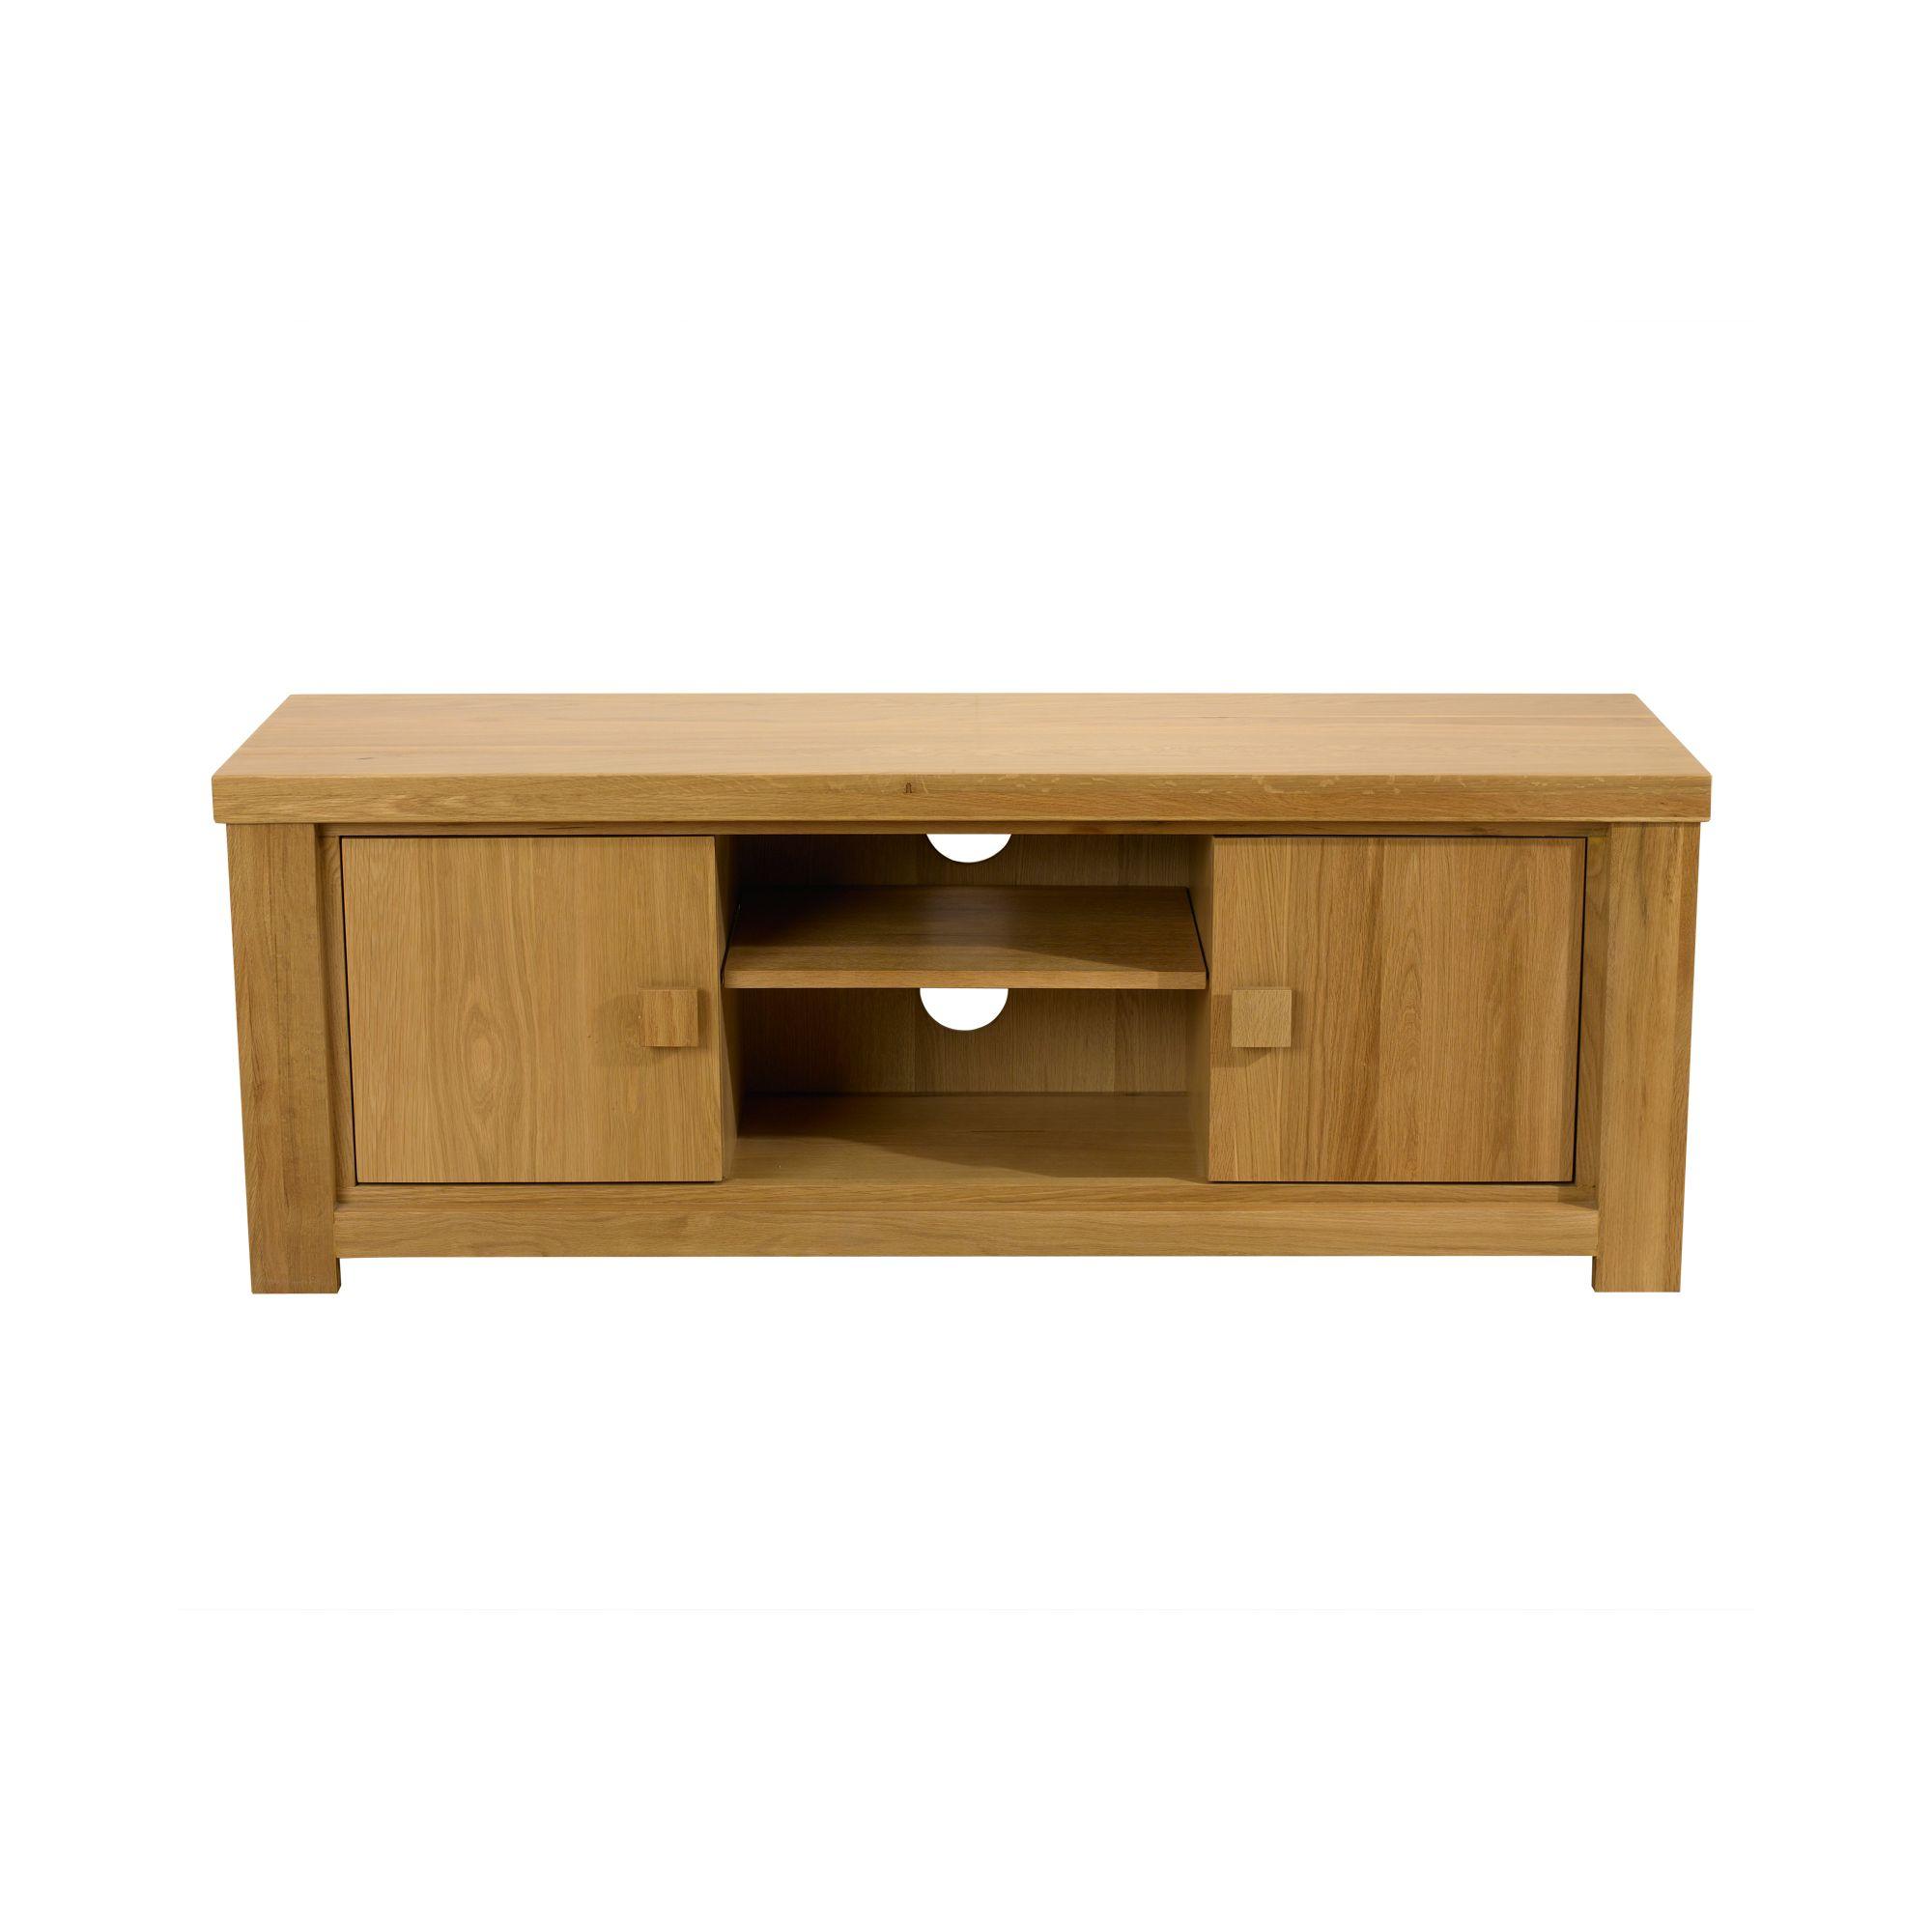 Mark Harris Furniture Barcelona 2 Door TV Unit in Solid Oak at Tescos Direct